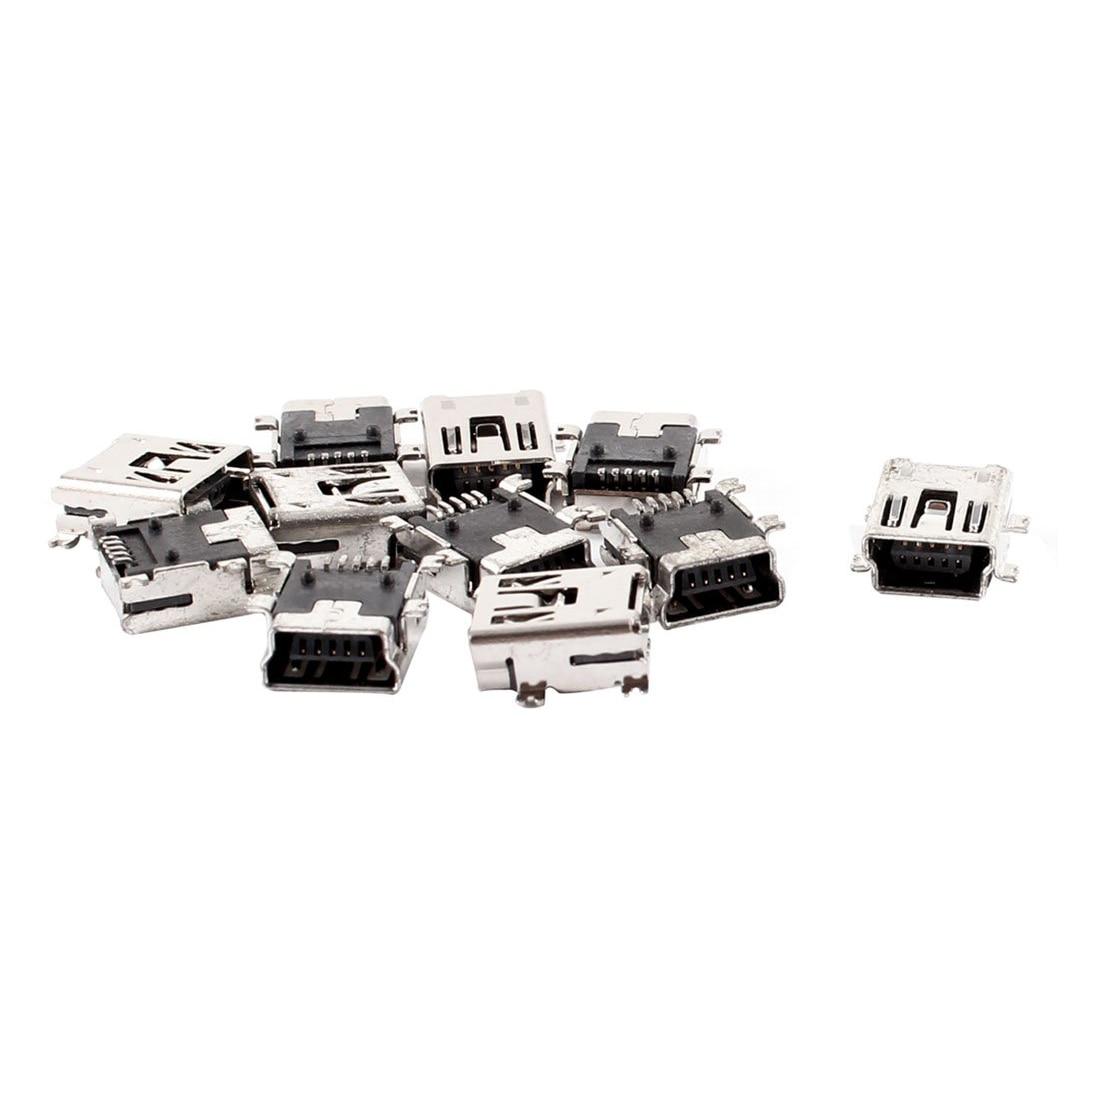 IMC Hot Mini USB Type B Female 5 Pin PCB Board Mount Jack